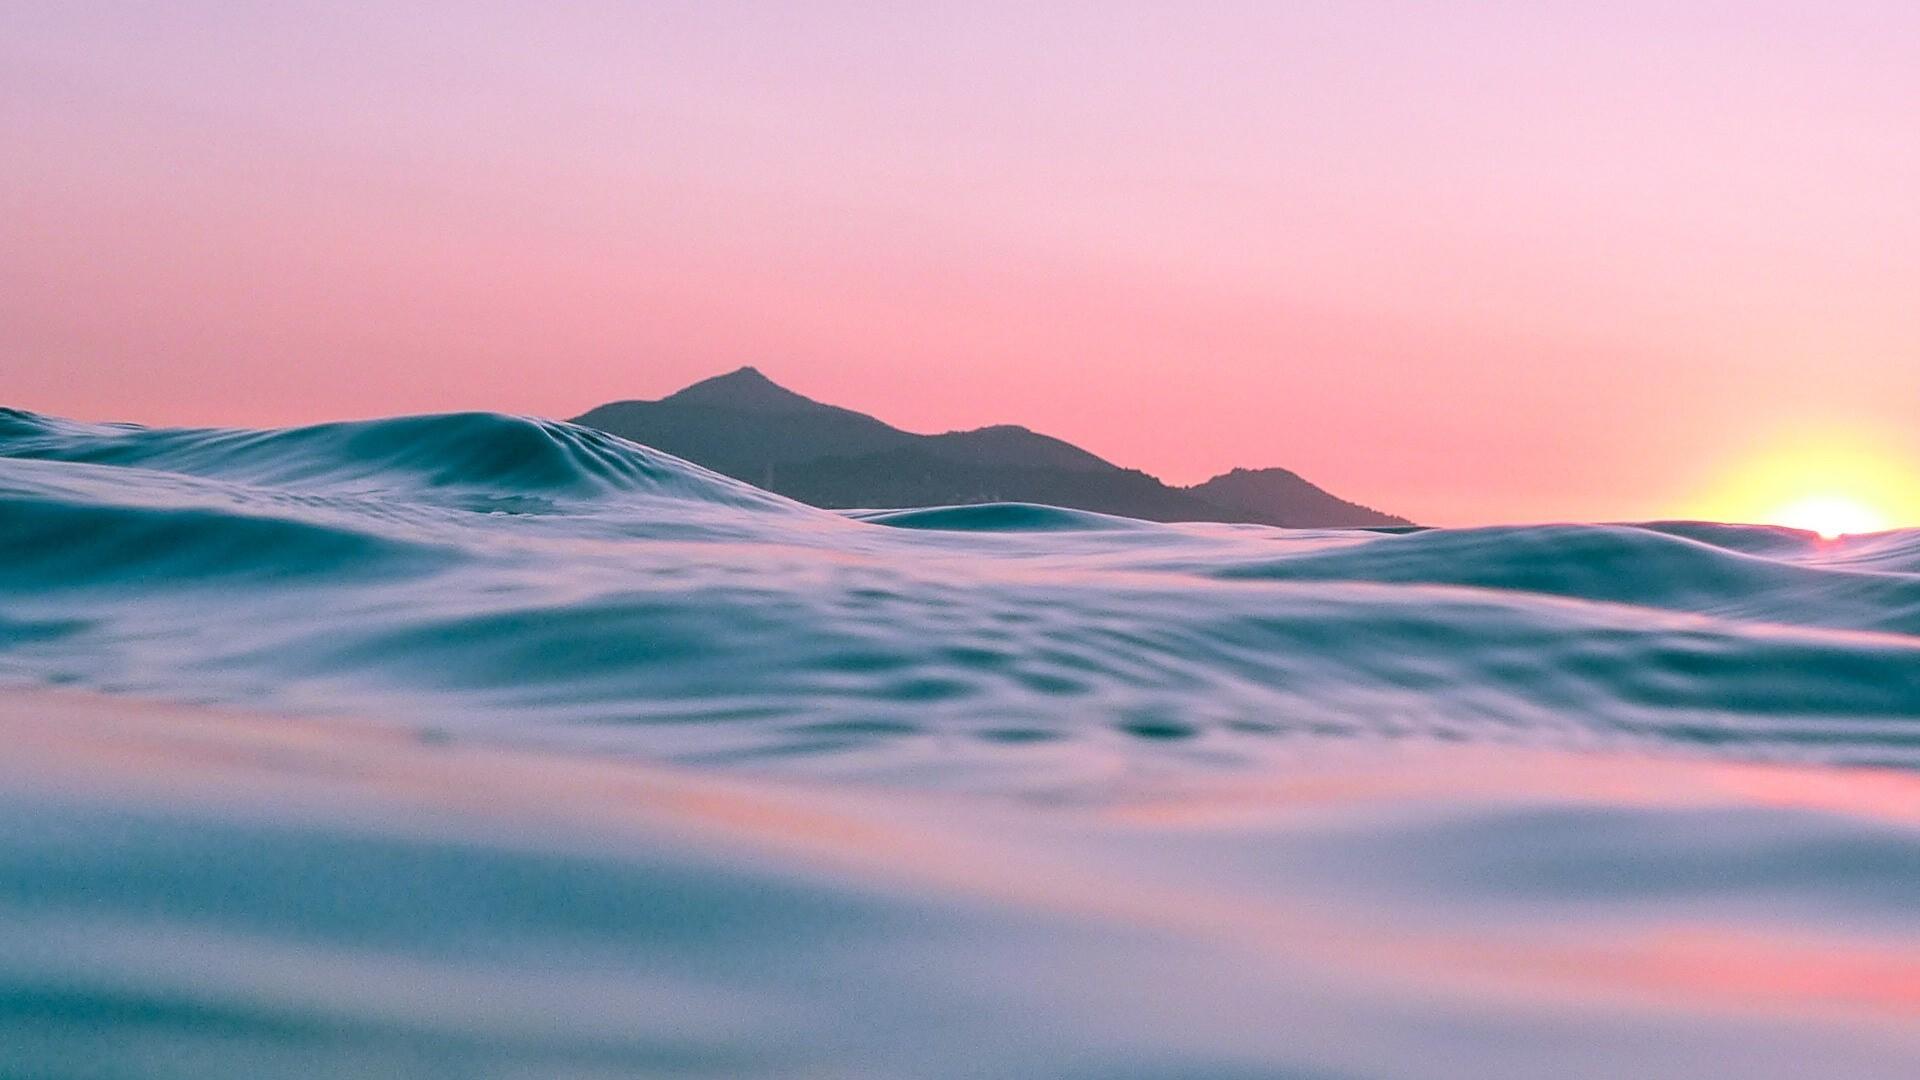 Summer Sea Water Hd Pics Hd Wallpapers